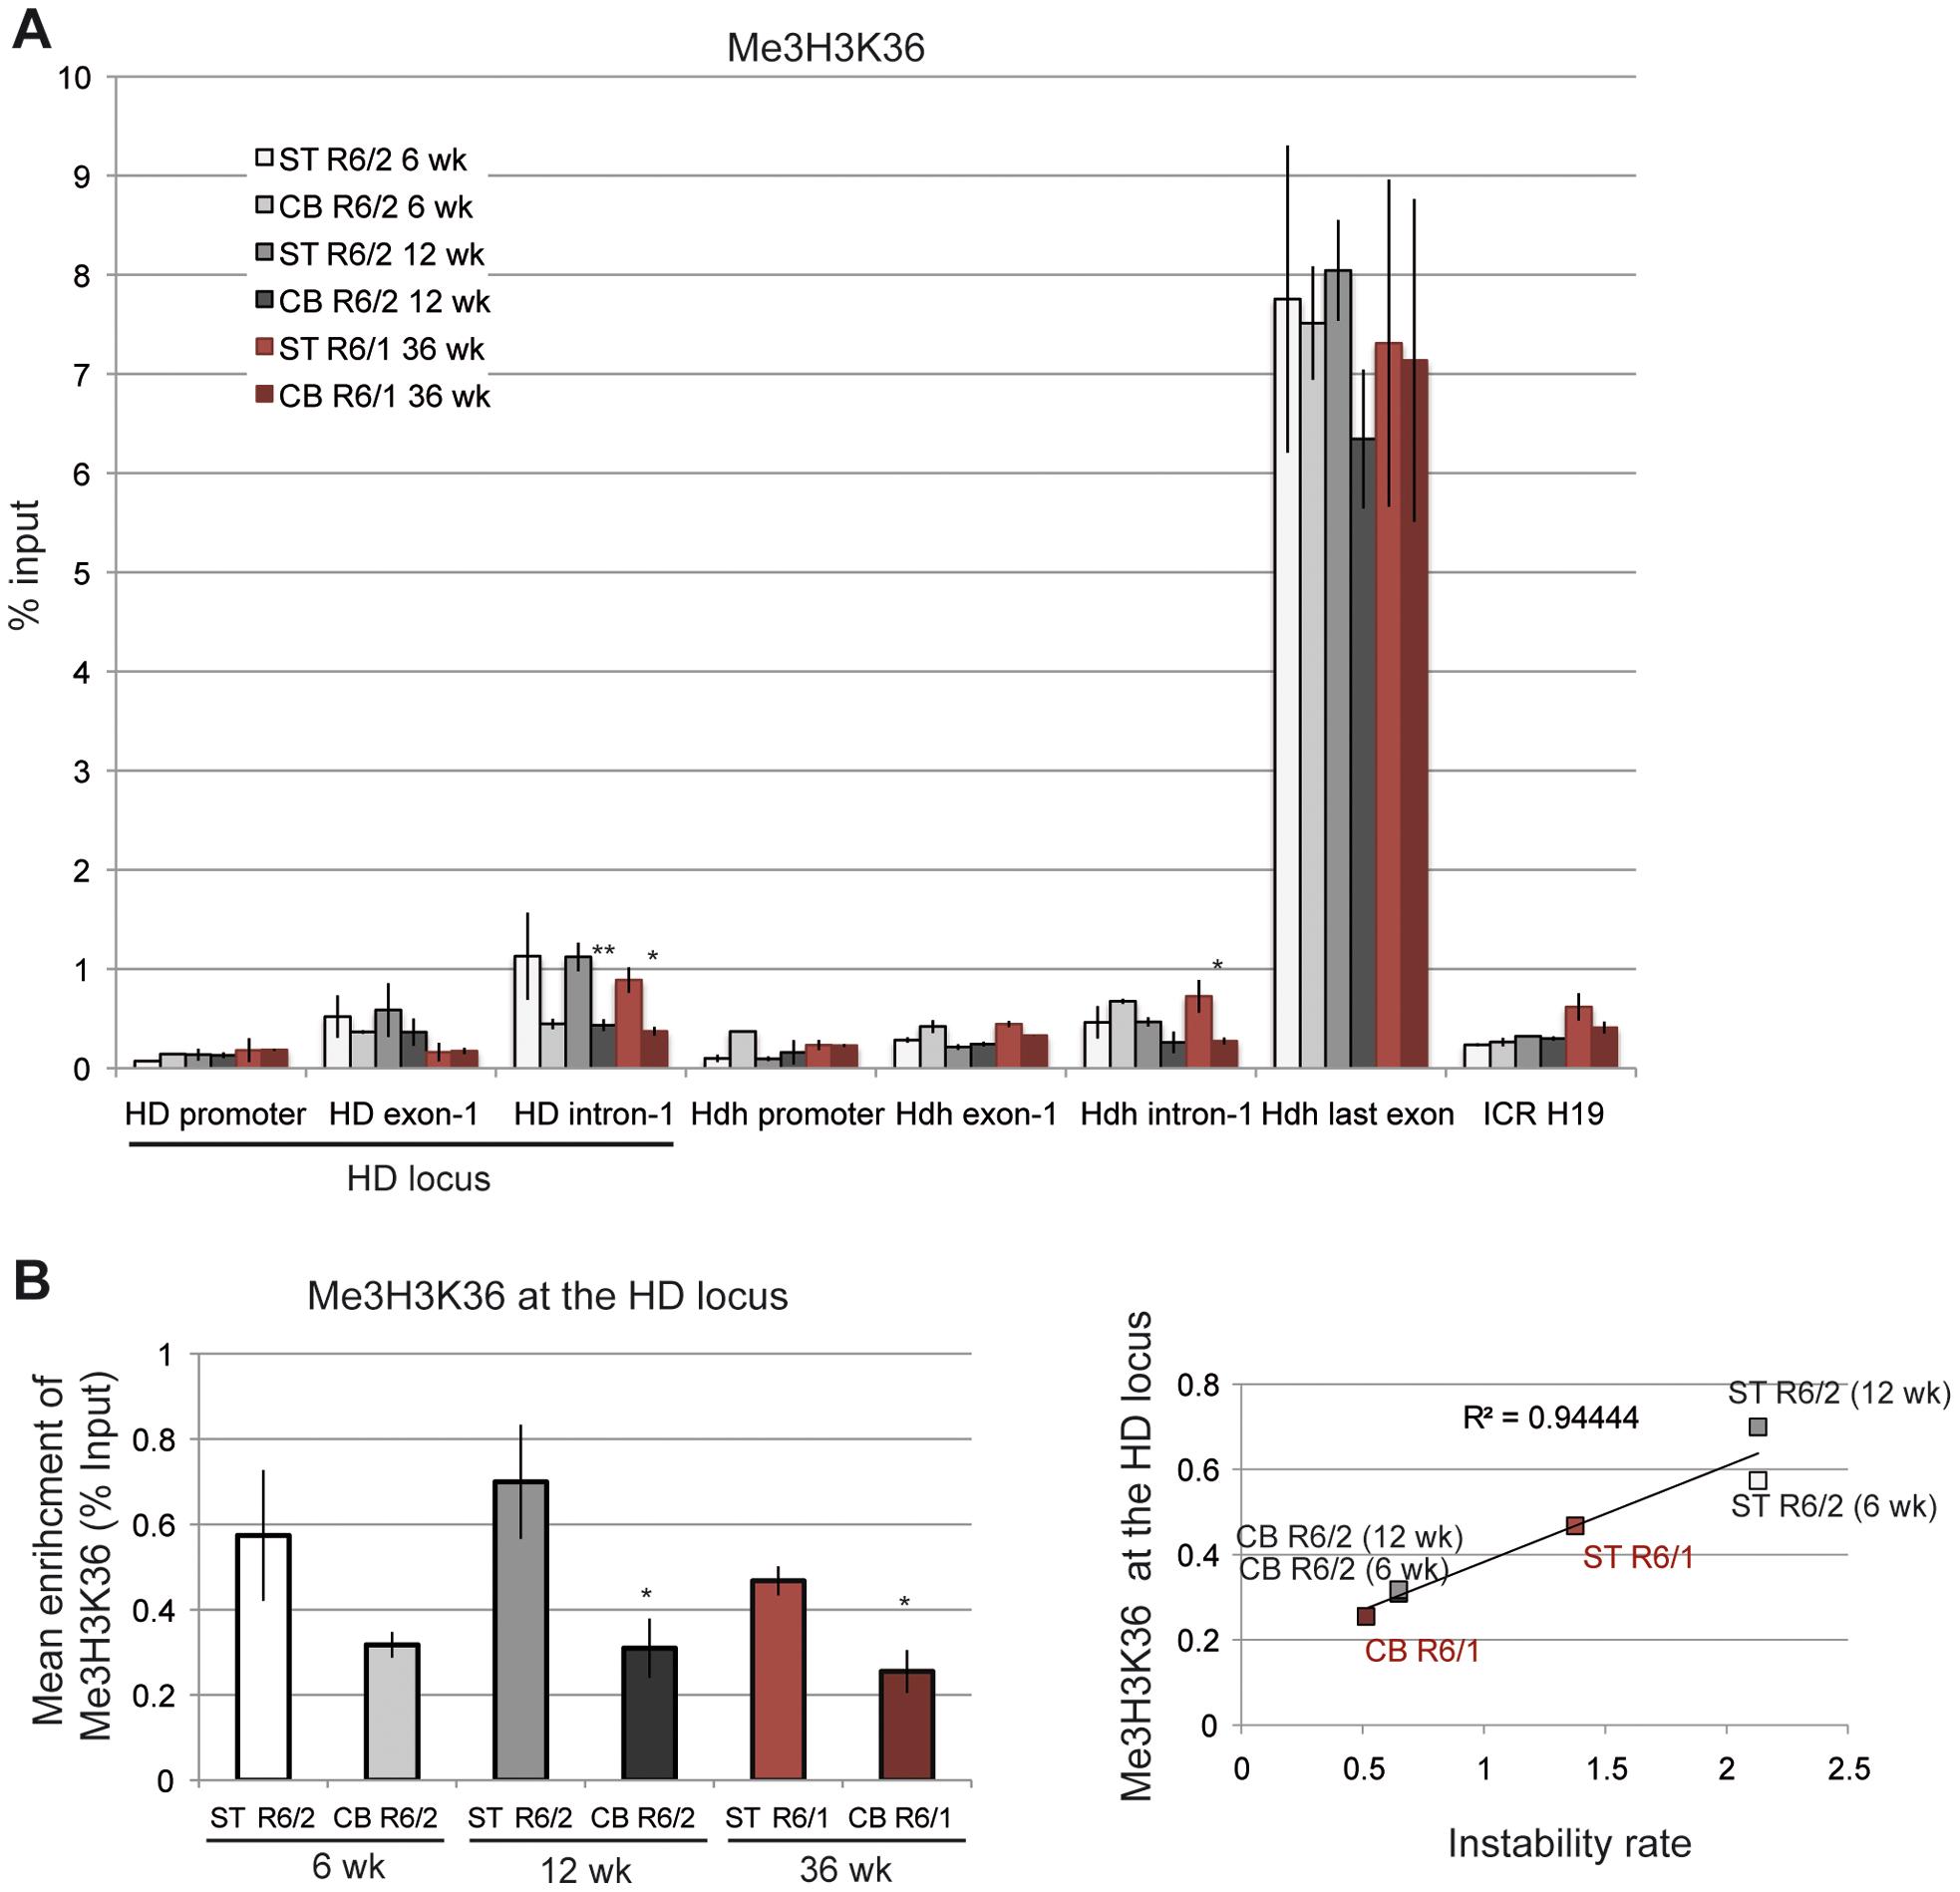 Me3H3K36 at the HD locus in R6/1 and R6/2 striatum and cerebellum.